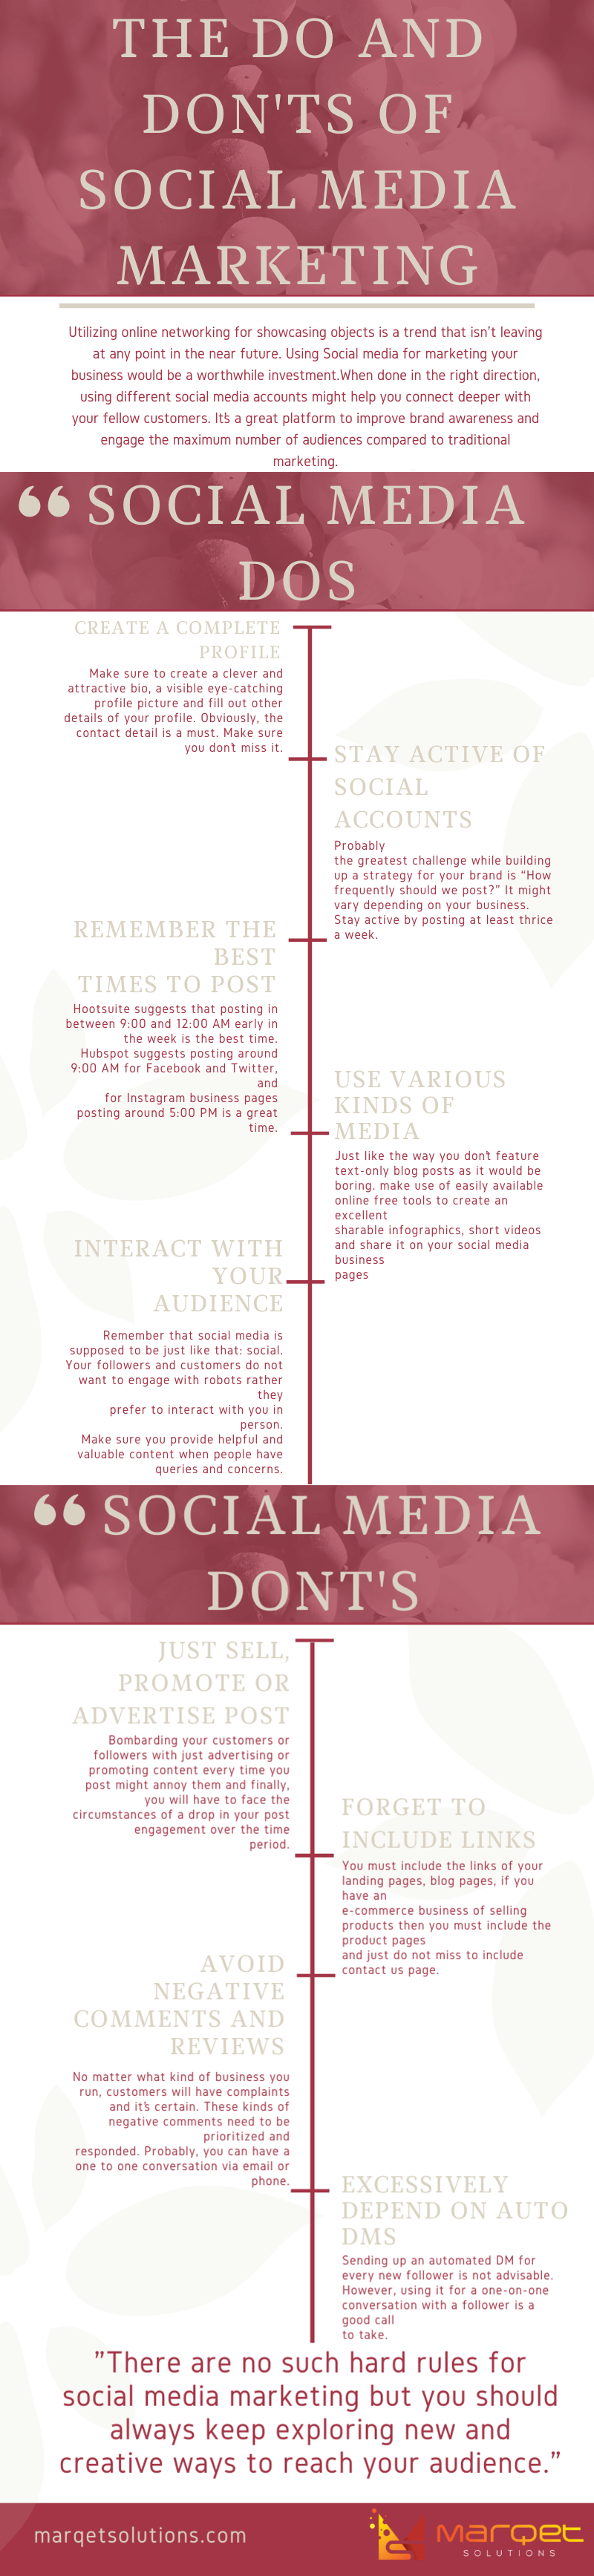 The do and don'ts of social media marketing